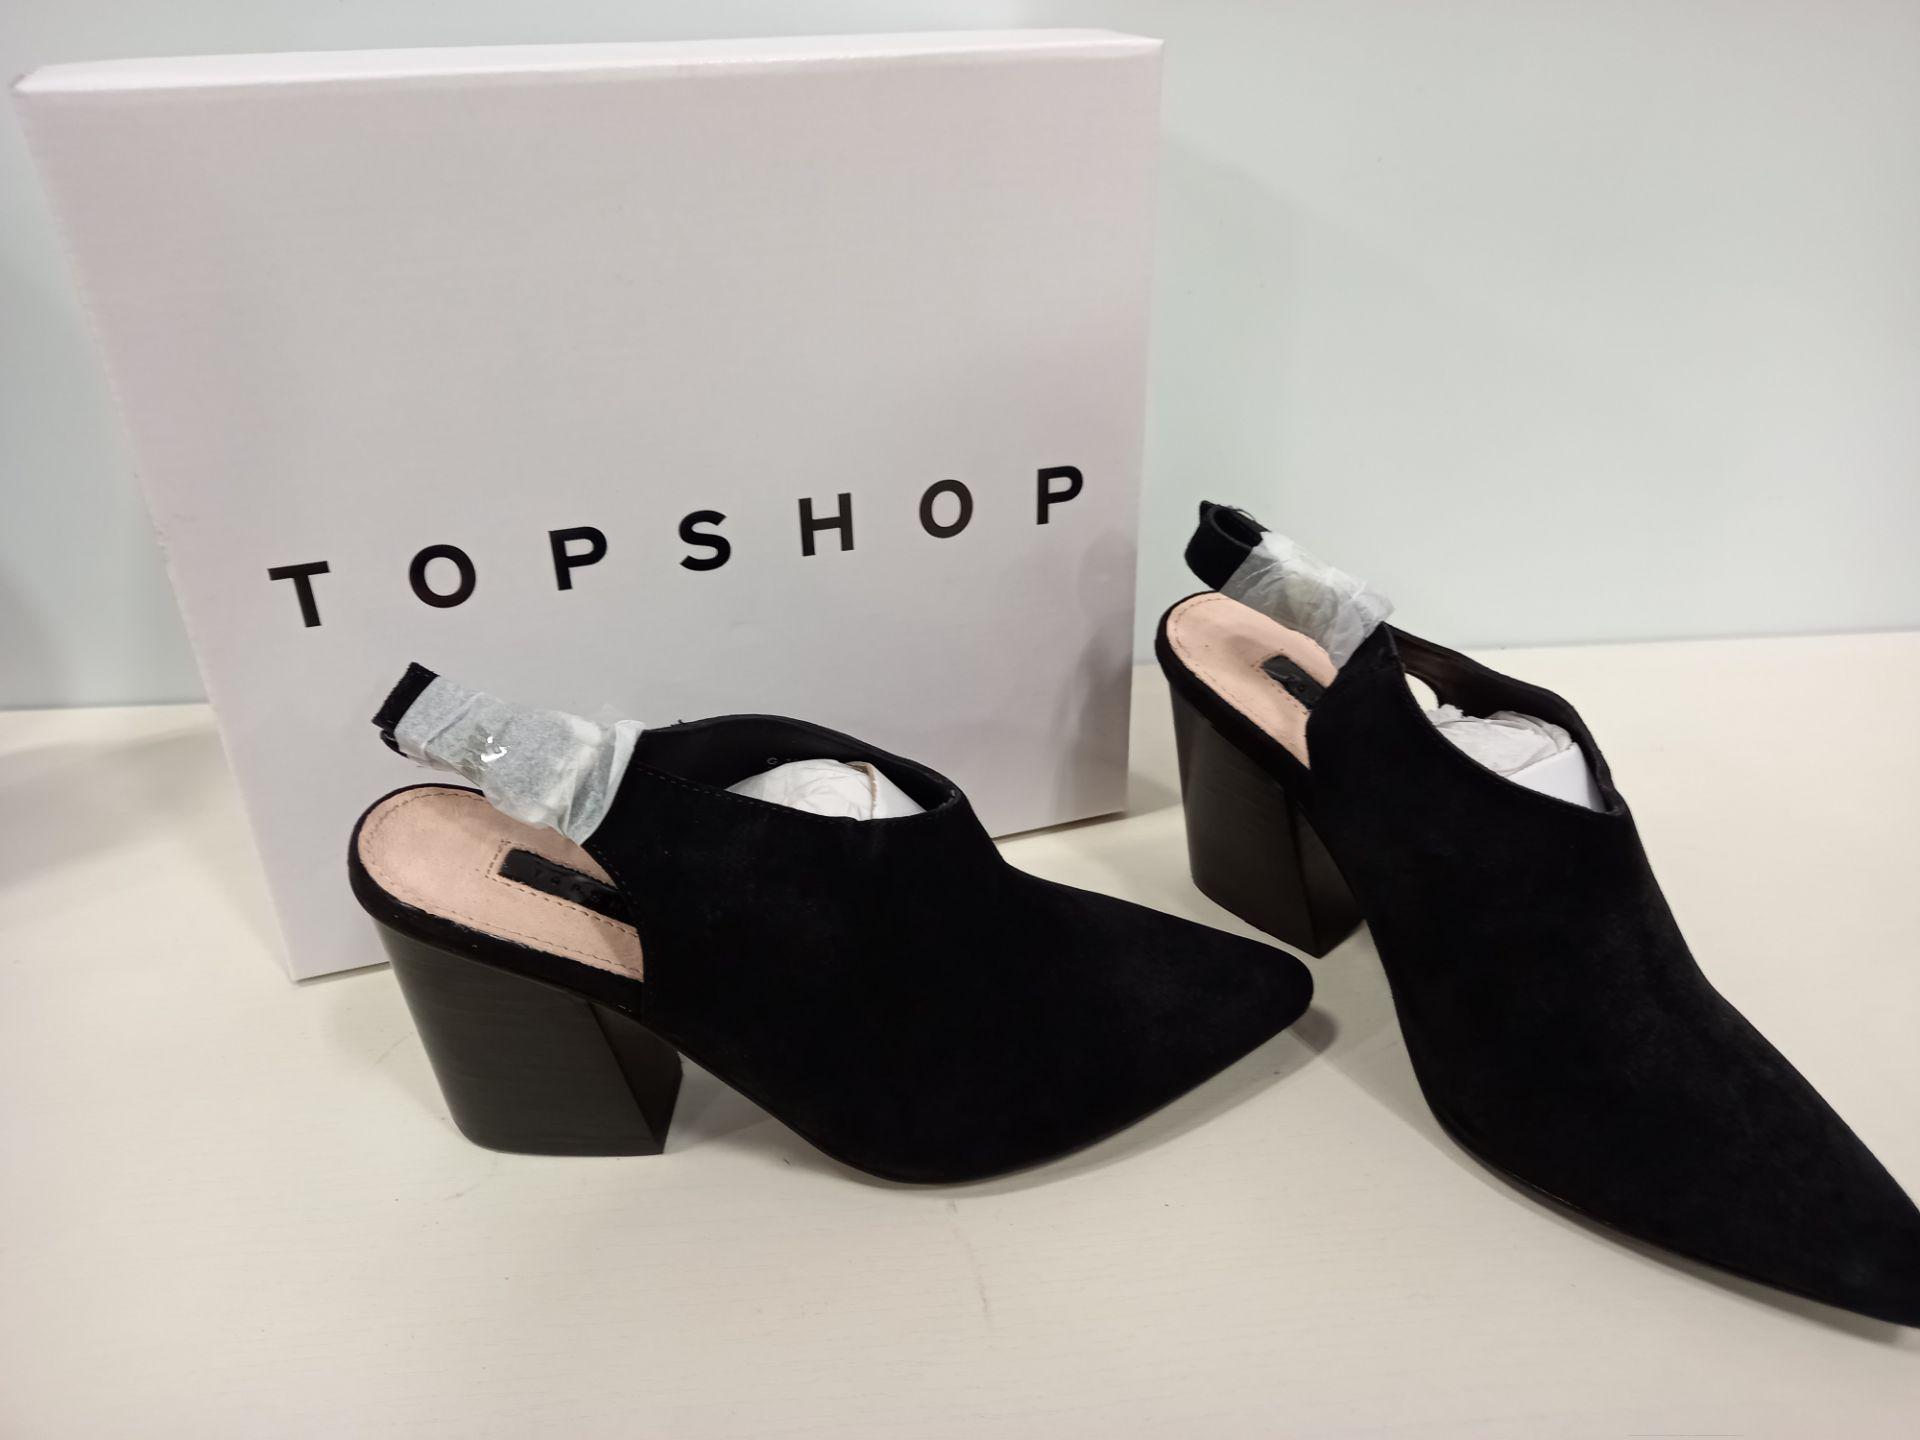 15 X BRAND NEW TOPSHOP GOJI BLACK SHOES UK SIZE 4 RRP £46.00 (TOTAL RRP £690.00)